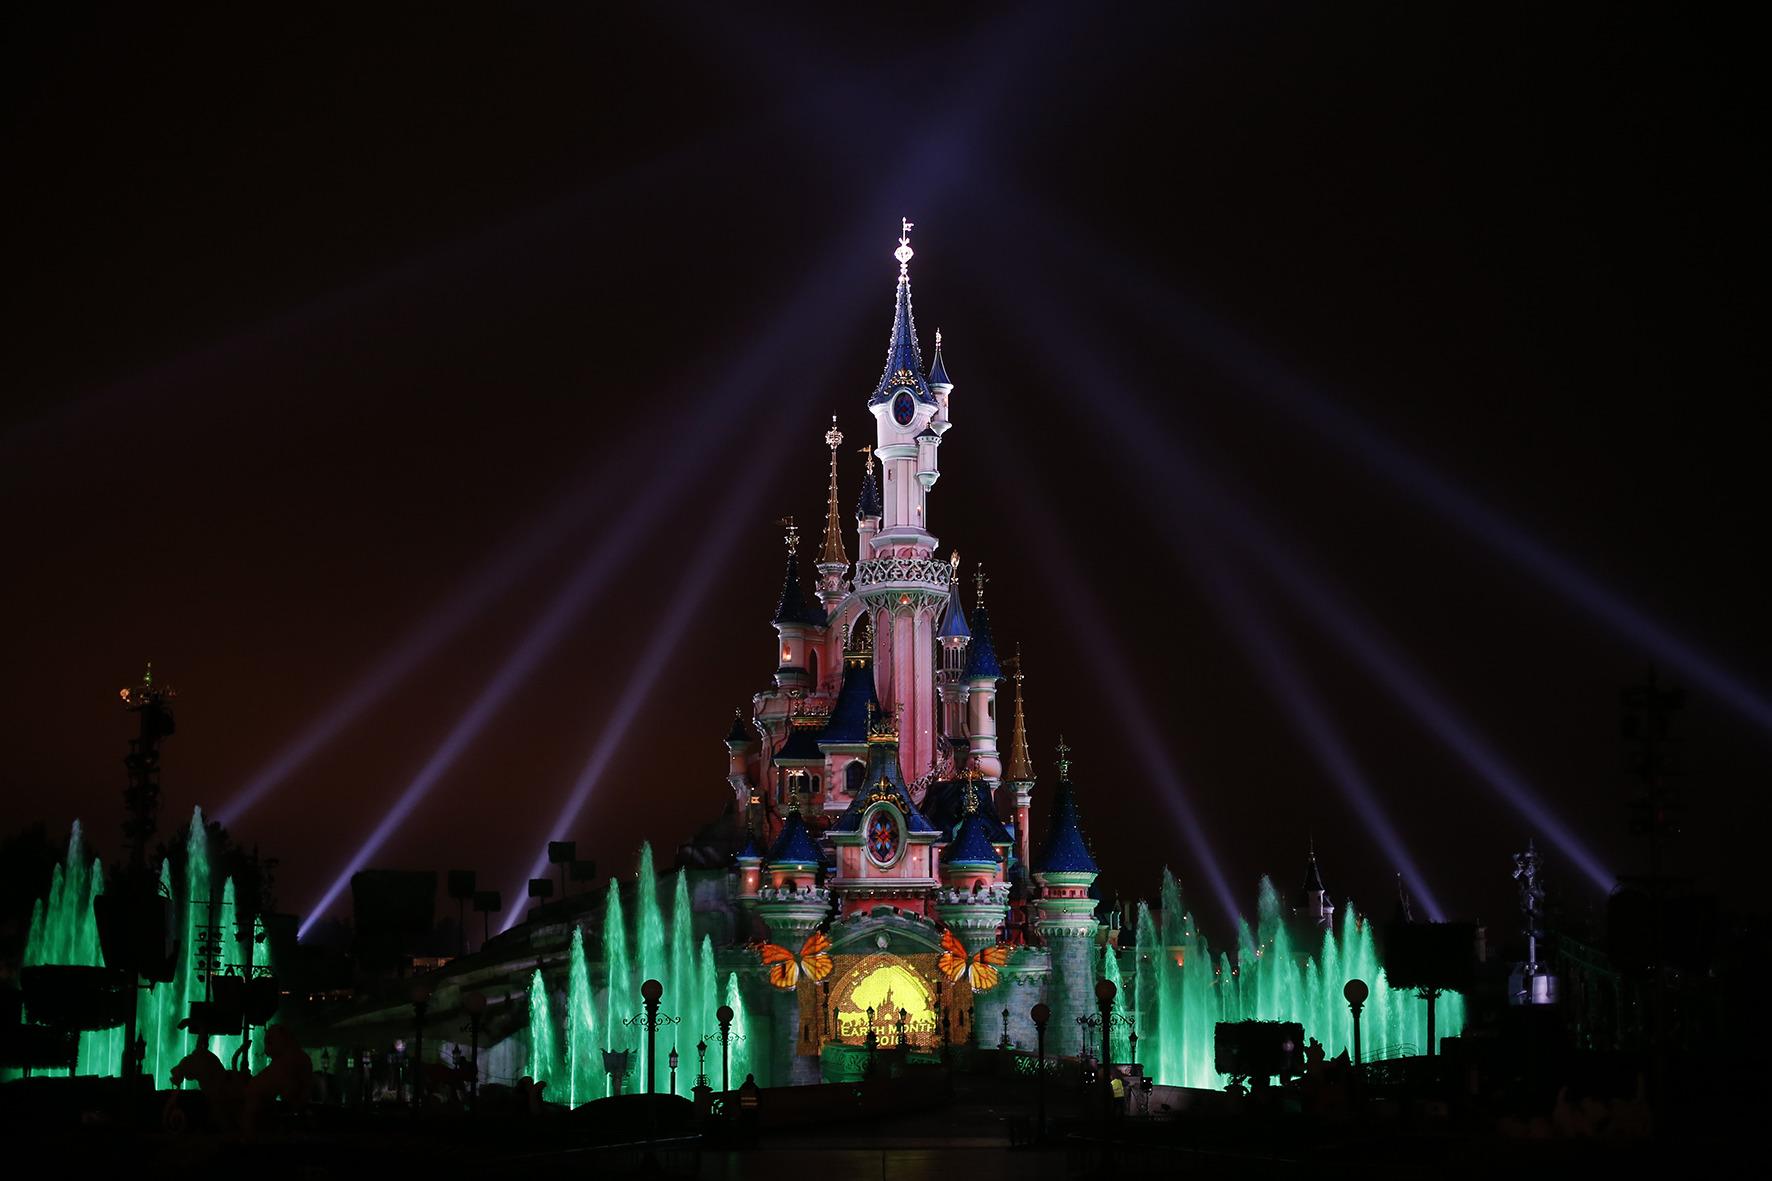 2019 - Disneynature Dn00110